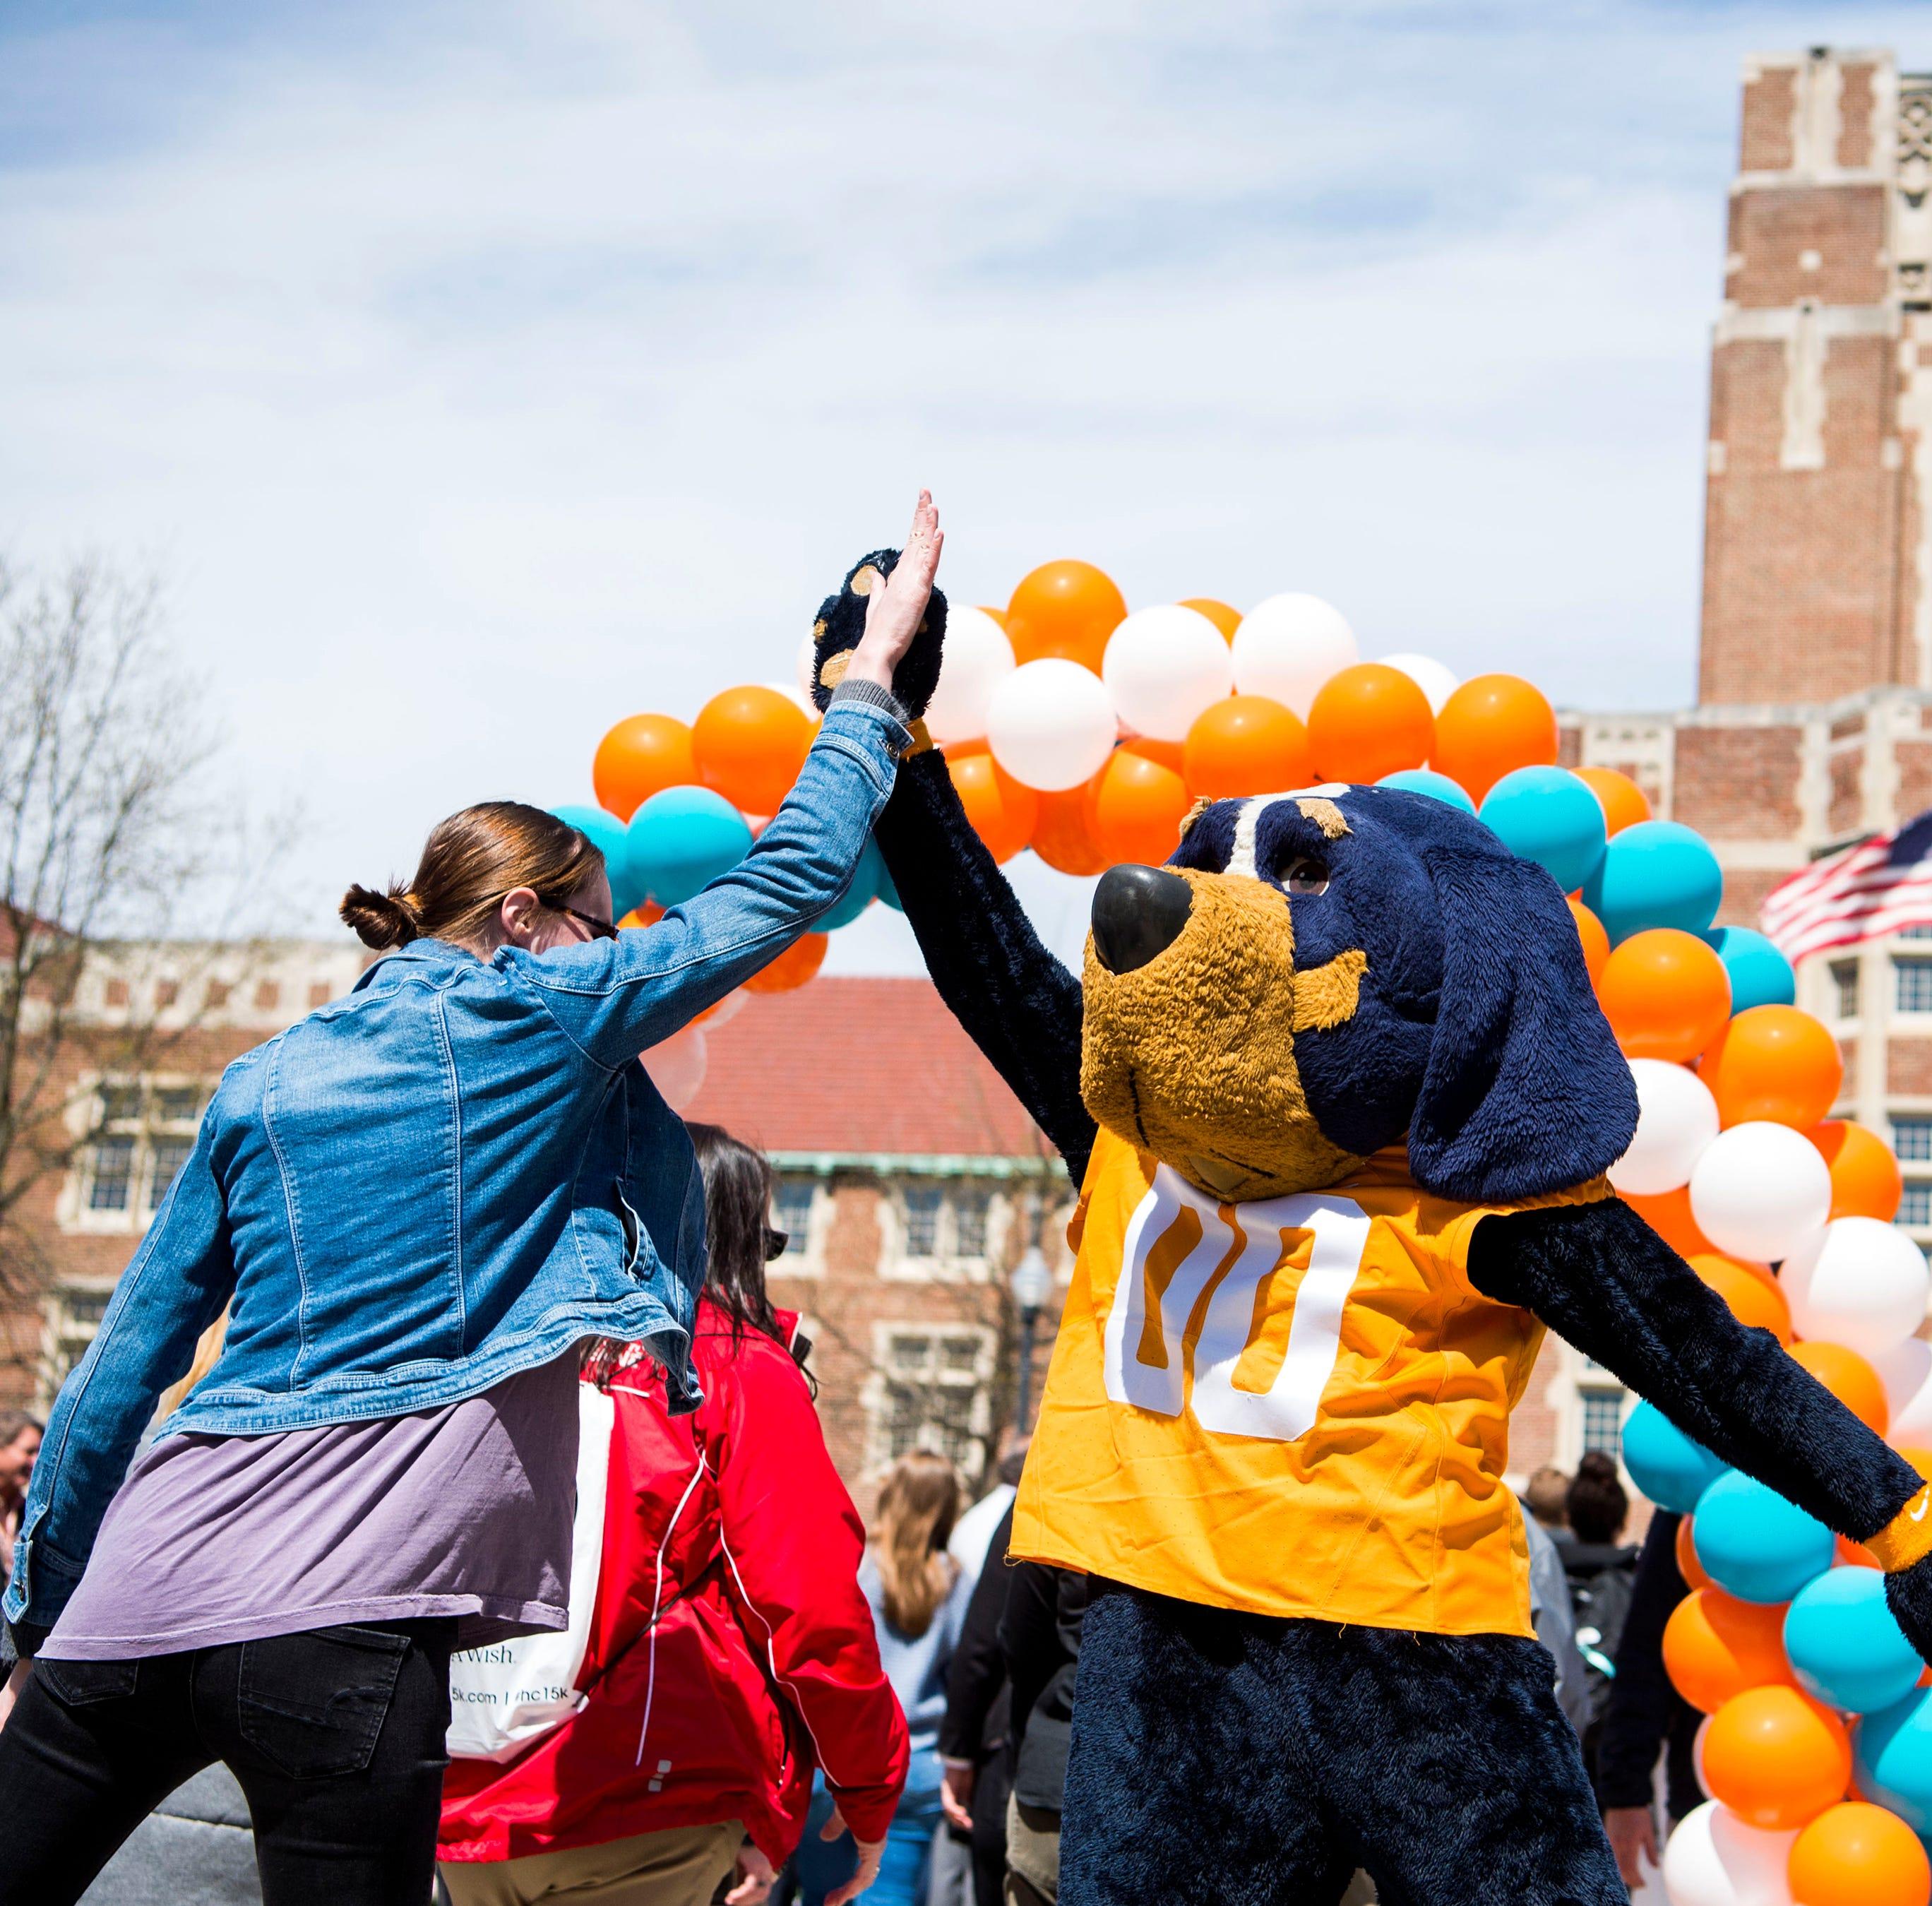 Tennessee Vols' Big Orange Caravan of coaches, Phillip Fulmer shelved for mascot tour